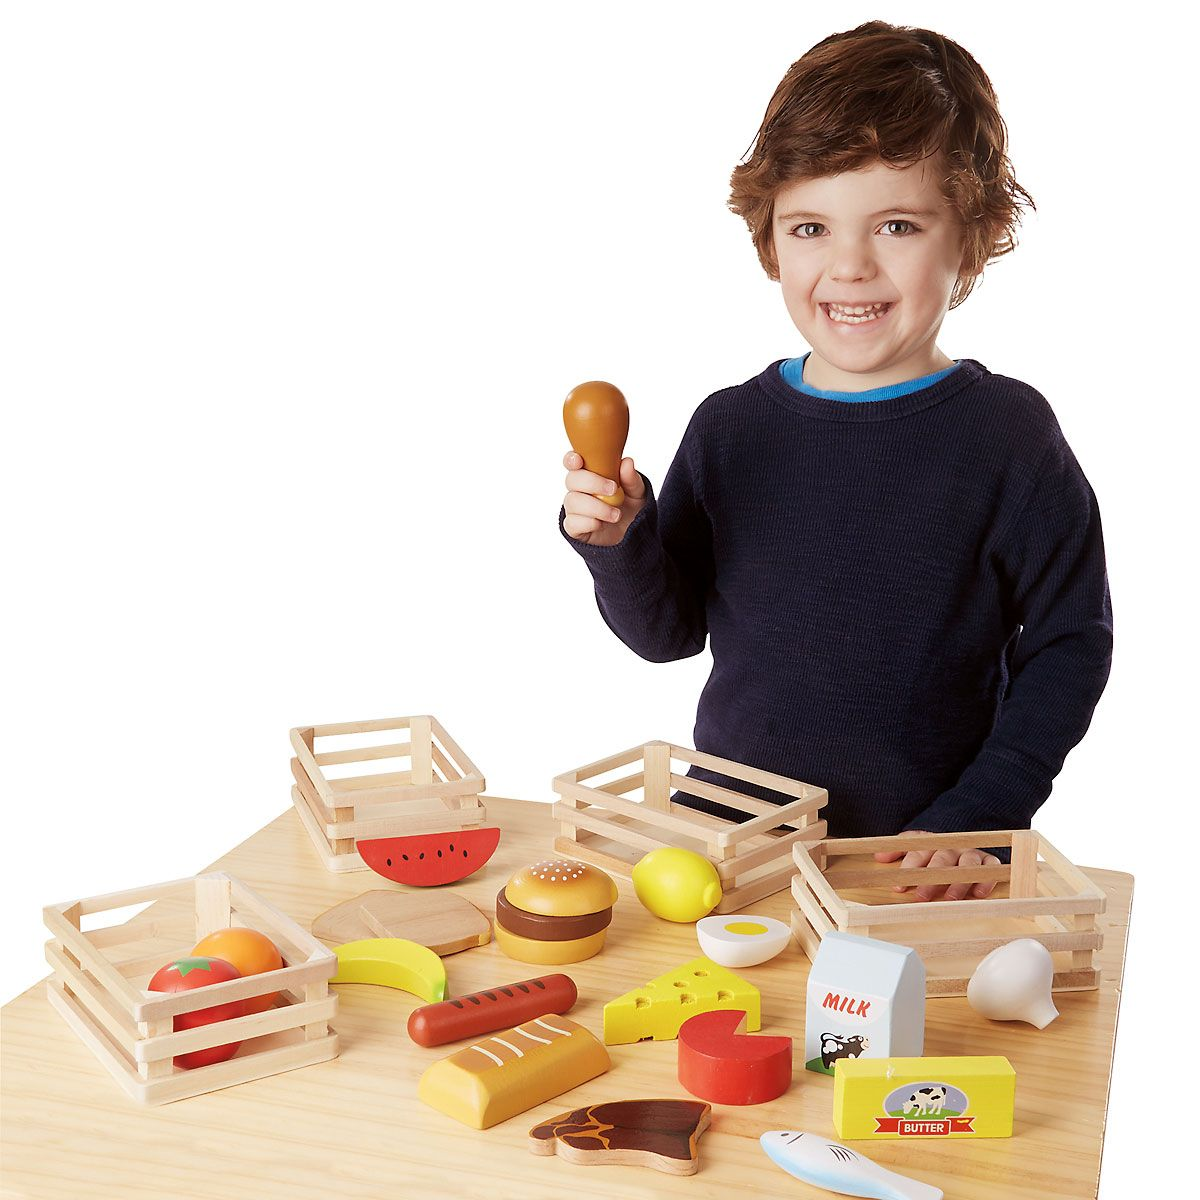 Food Groups Play Food by Melissa & Doug®